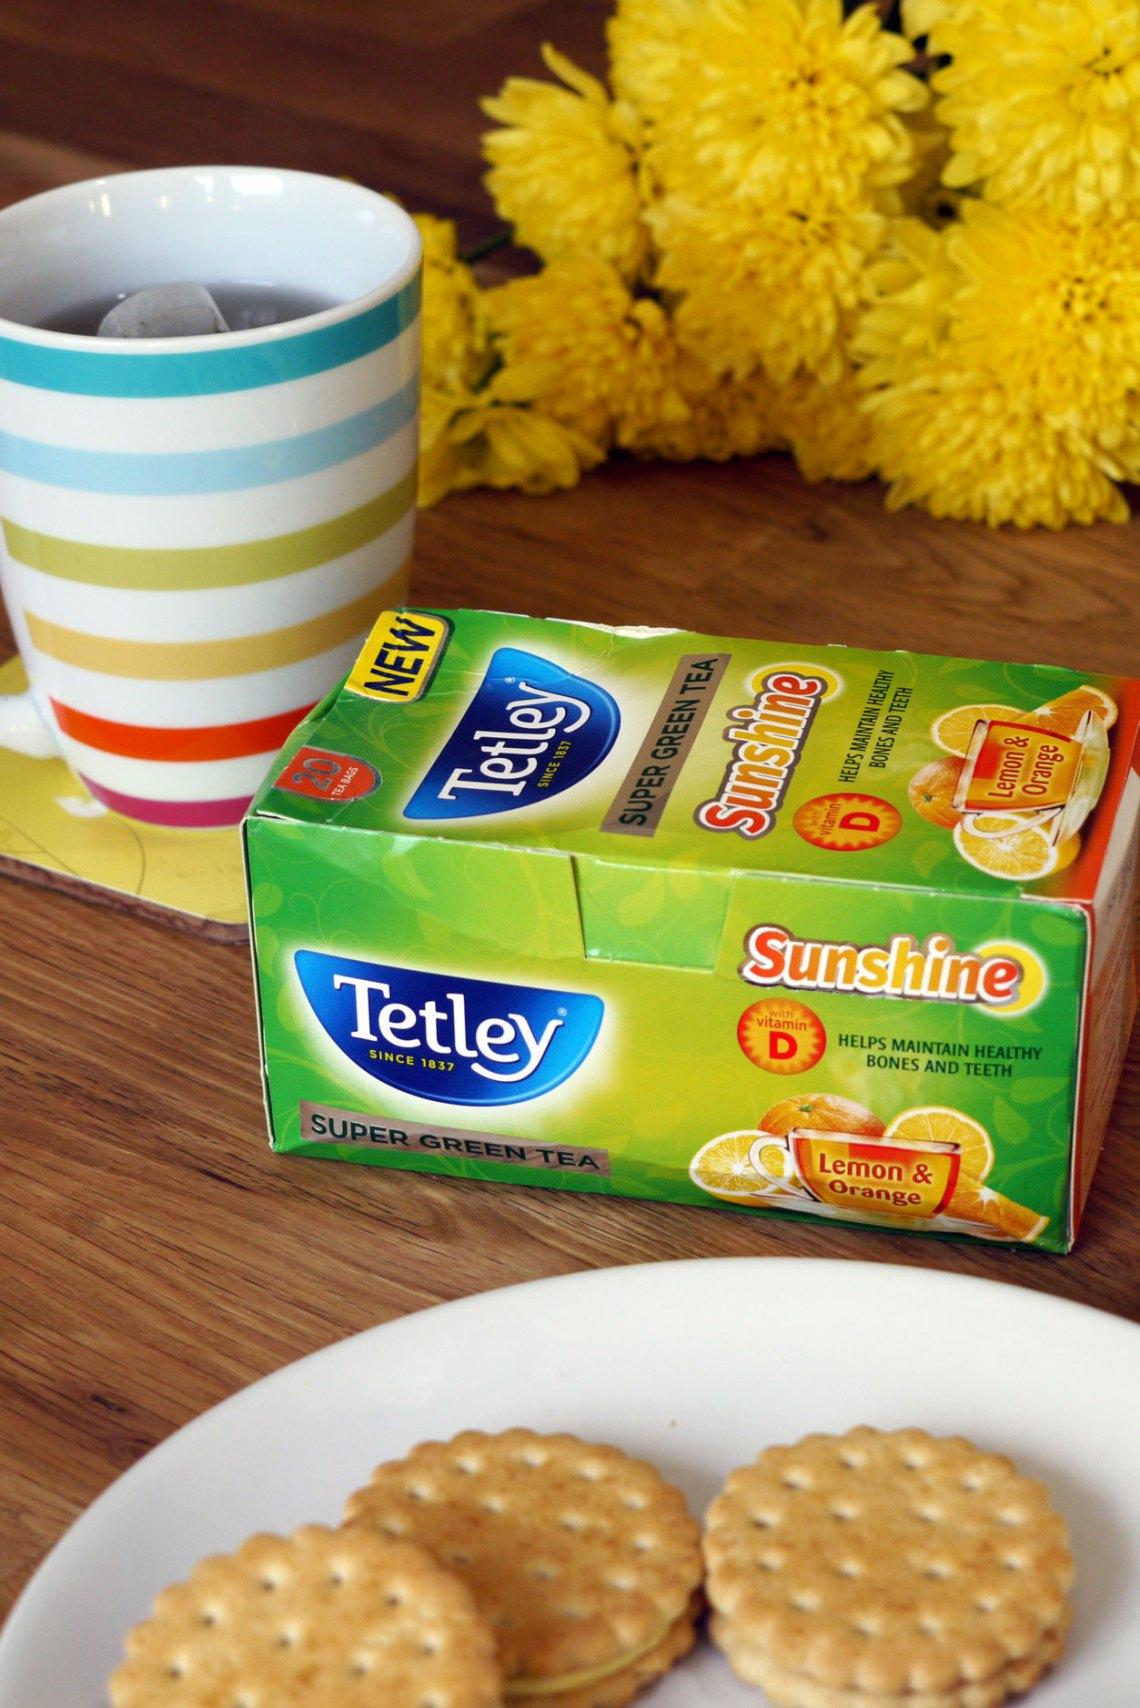 Tetley's Super Green Tea Sunshine